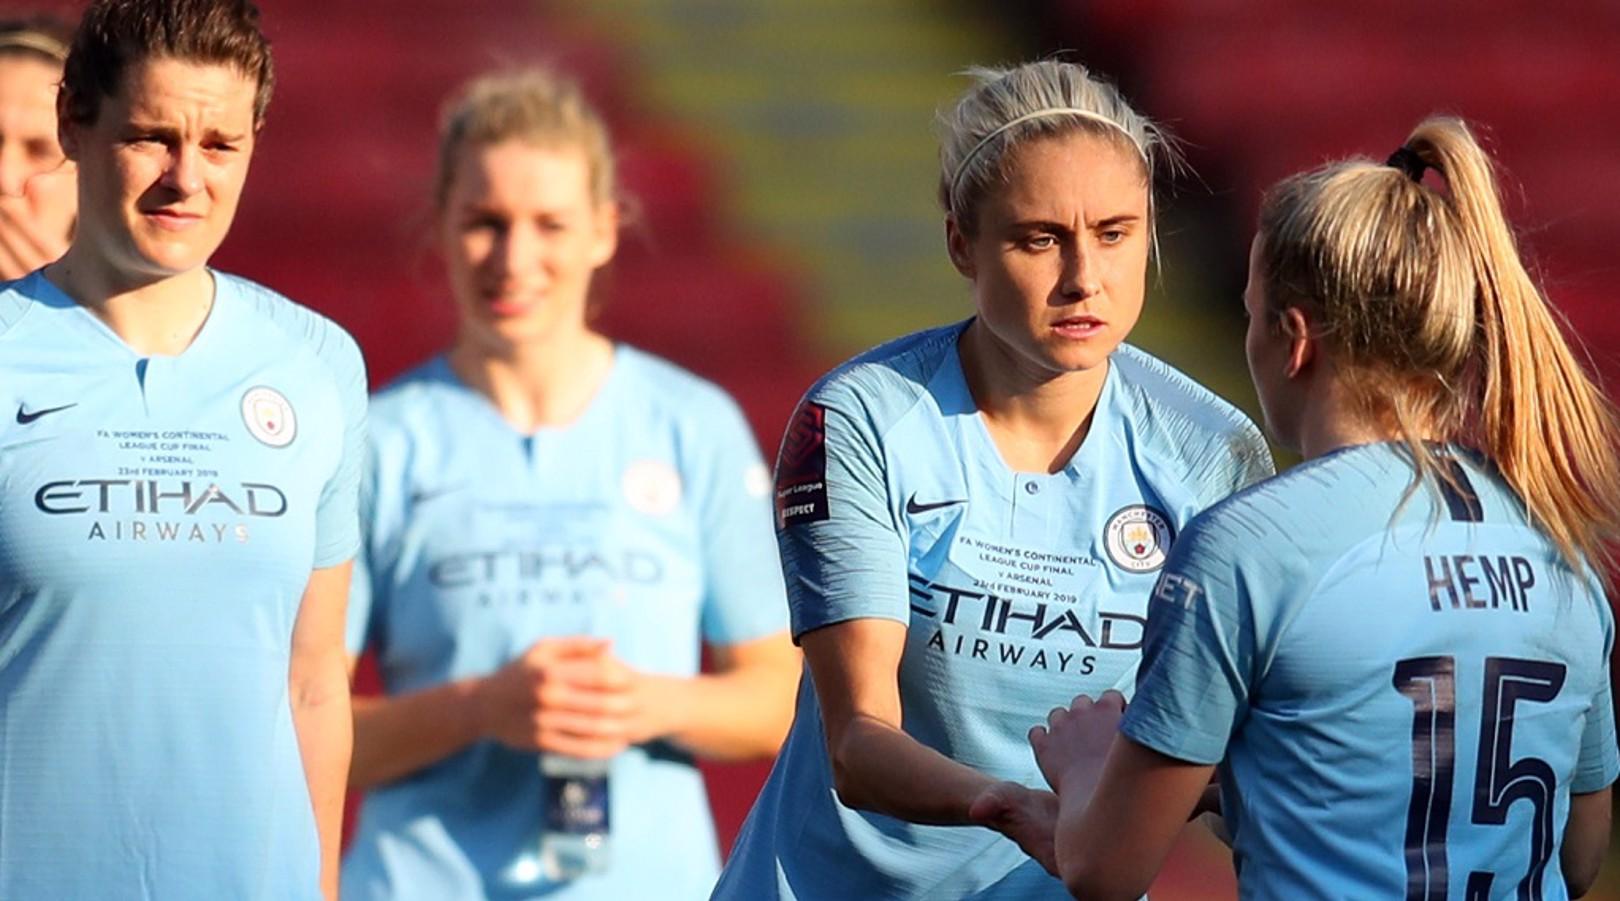 Dream Wembley debut for Hemp